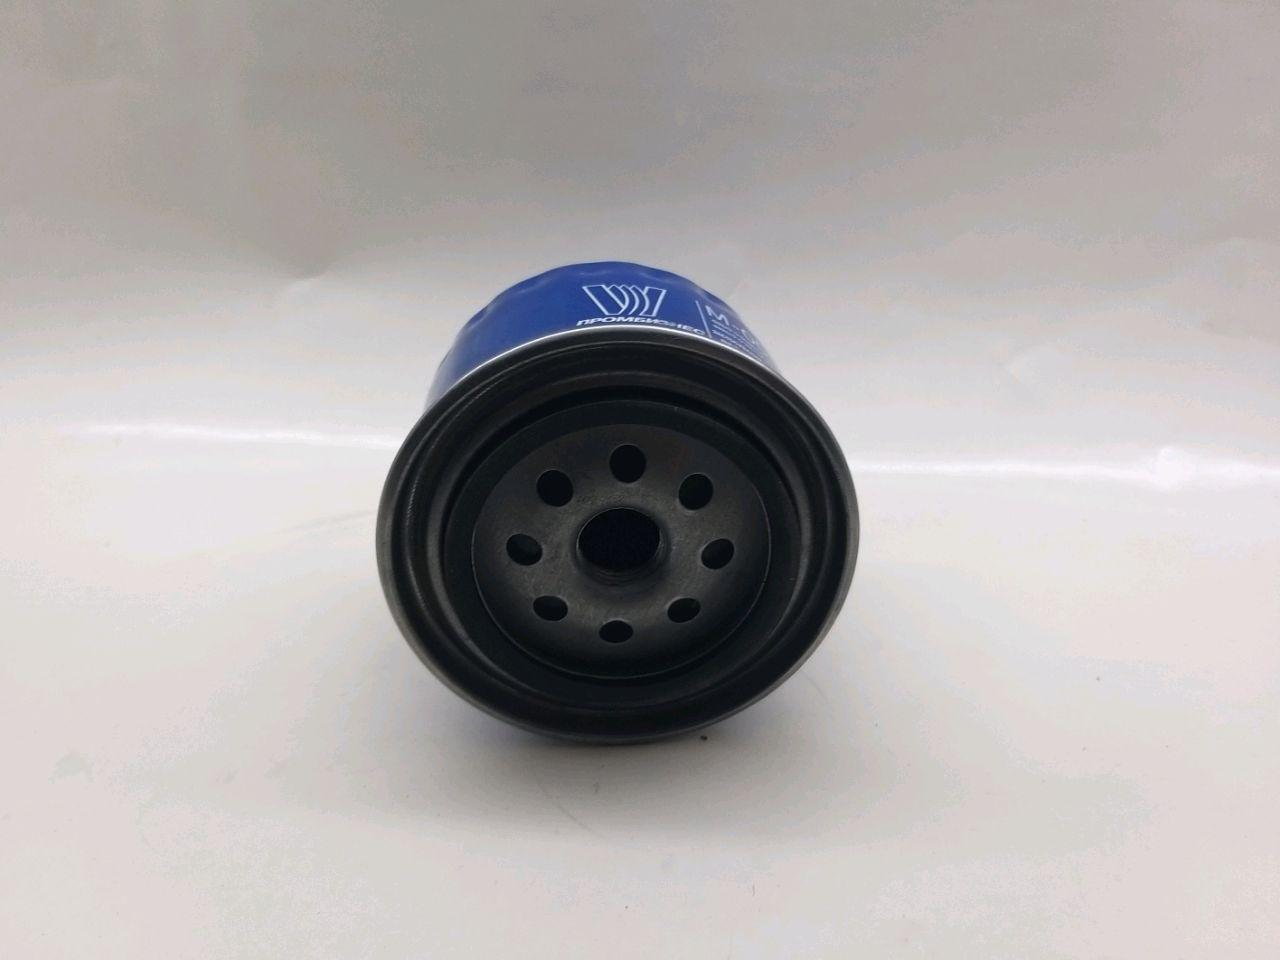 Filtru de ulei VAZ-2108/ 21099 (Mototex)